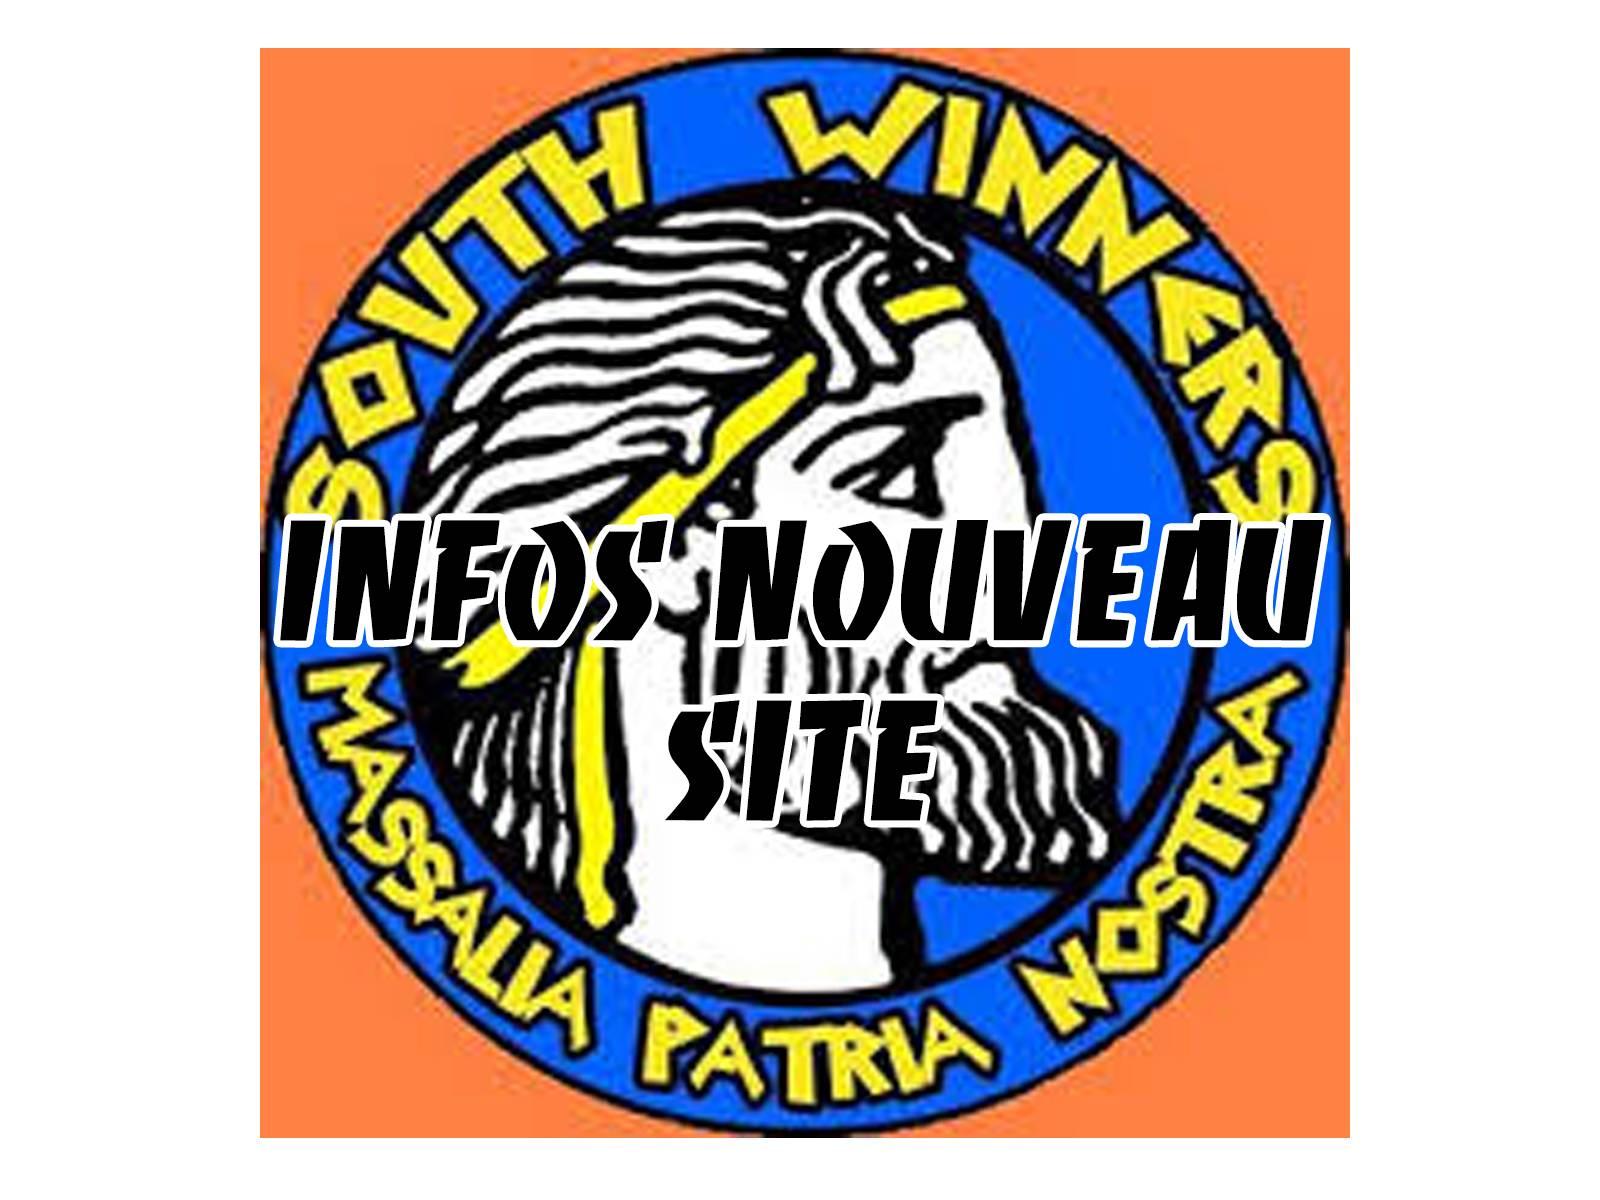 INFOS NOUVEAU SITE WINNERS